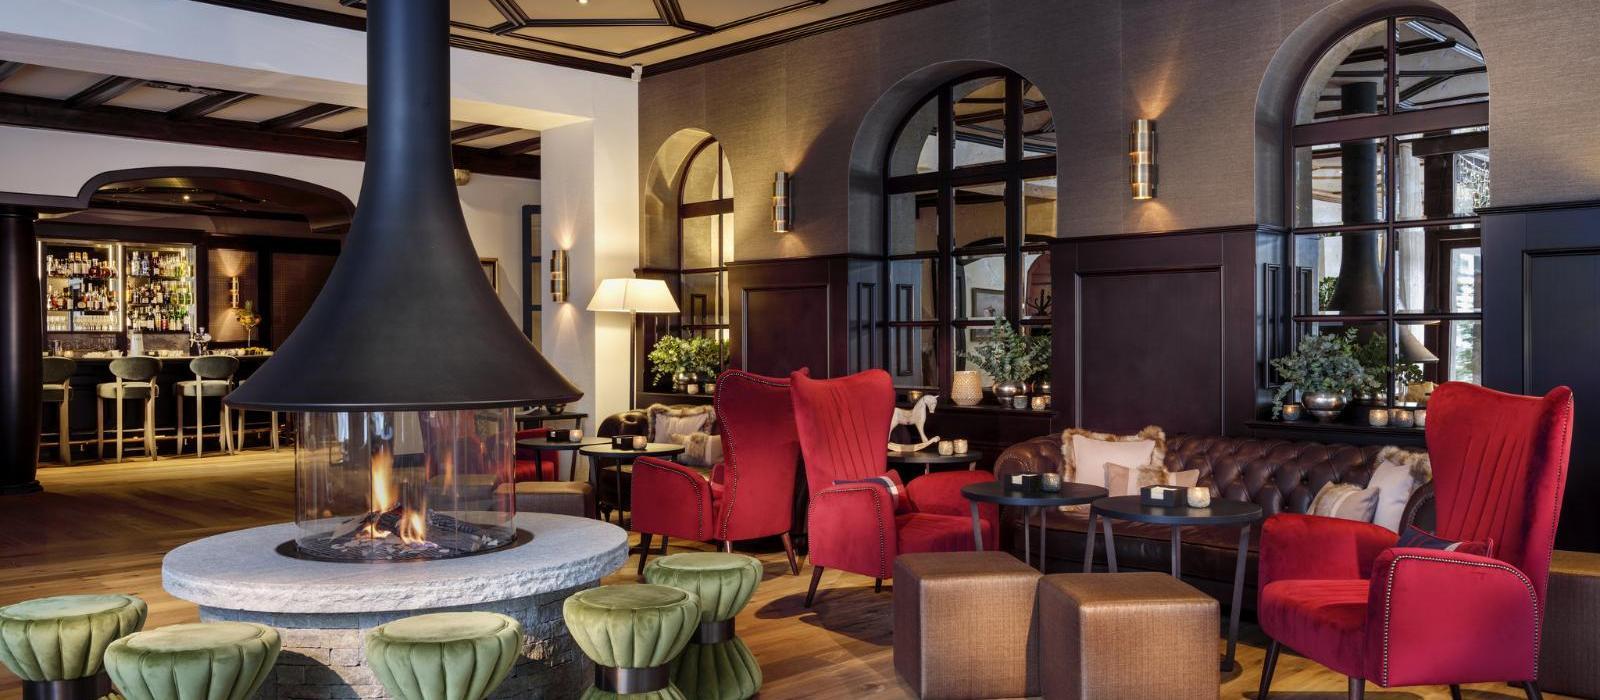 马特峰皇轩酒店(Mont Cervin Palace) 图片  www.lhw.cn